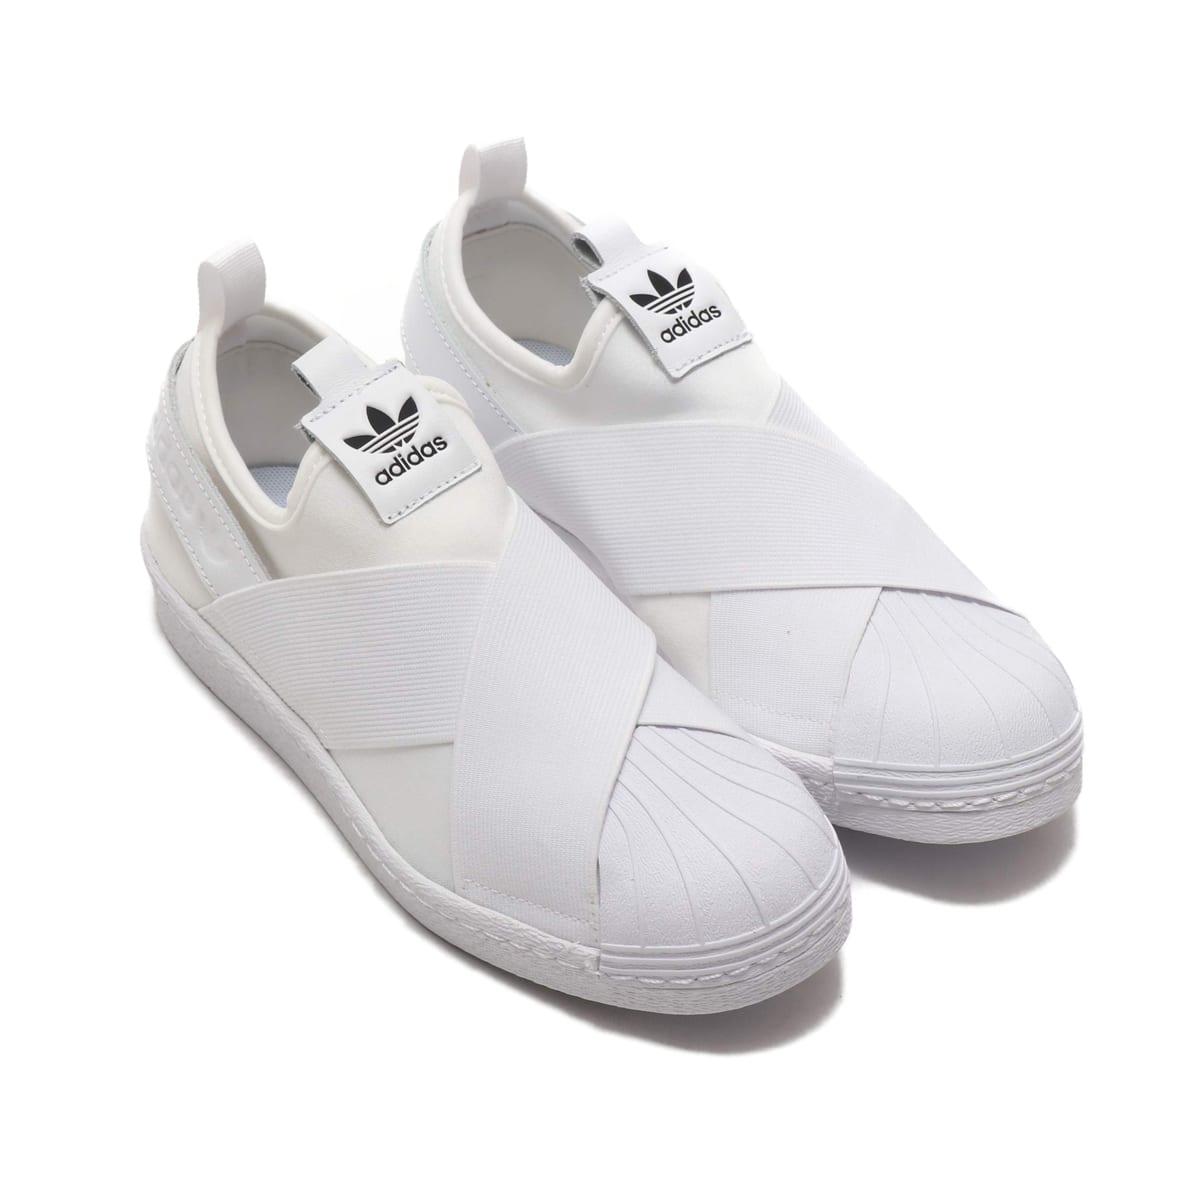 adidas Originals SUPER STAR SLIP ON W RUNNING WHITE/RUNNING WHITE/CORE BLACK 19SS-I_photo_large